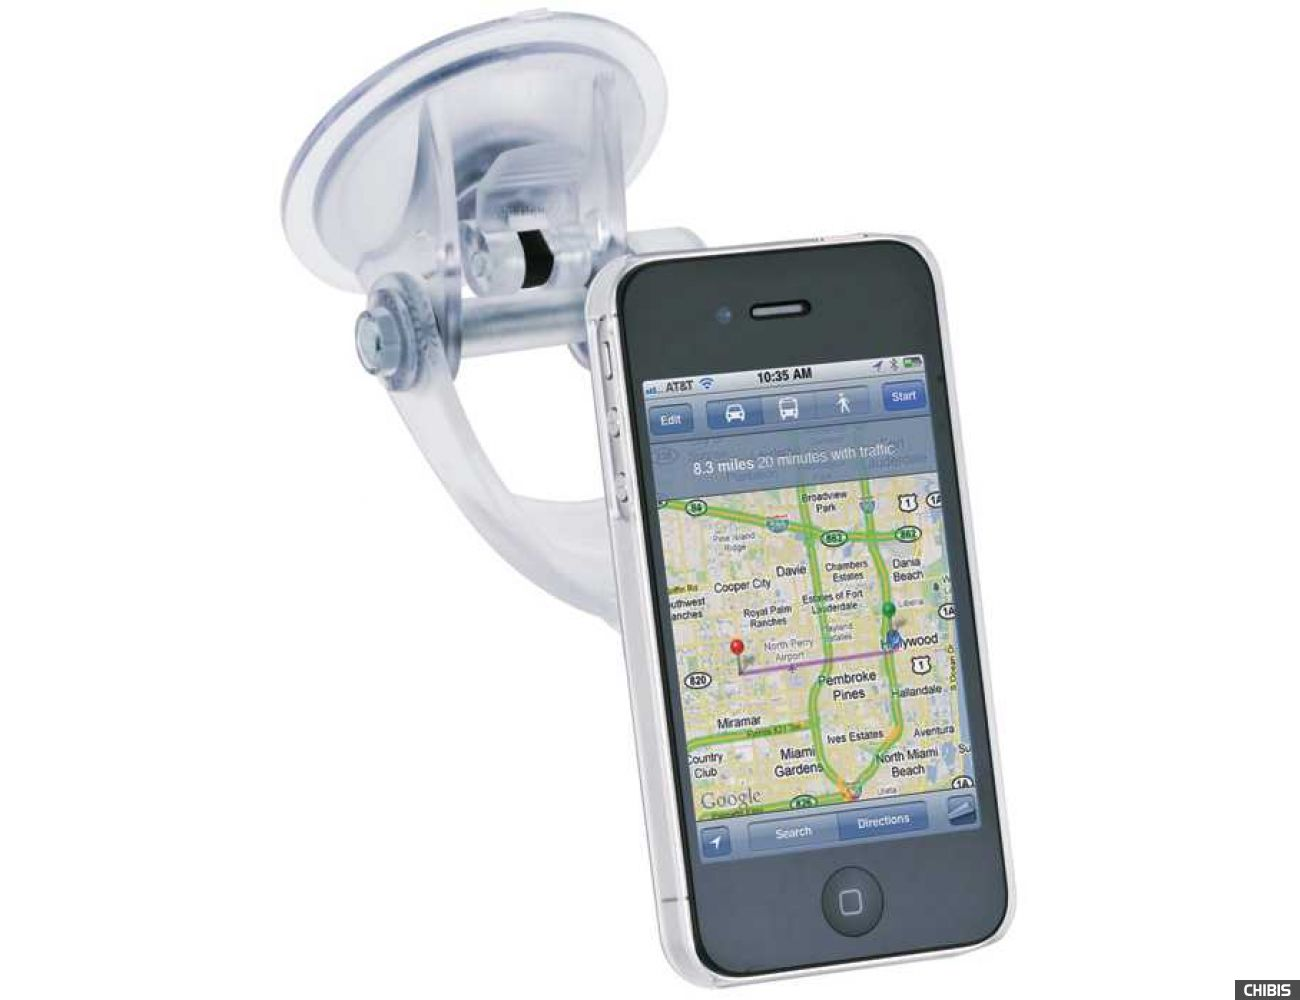 Автодержатель iGrip Clear Case Traveler iPhone 4 (T5-300183)